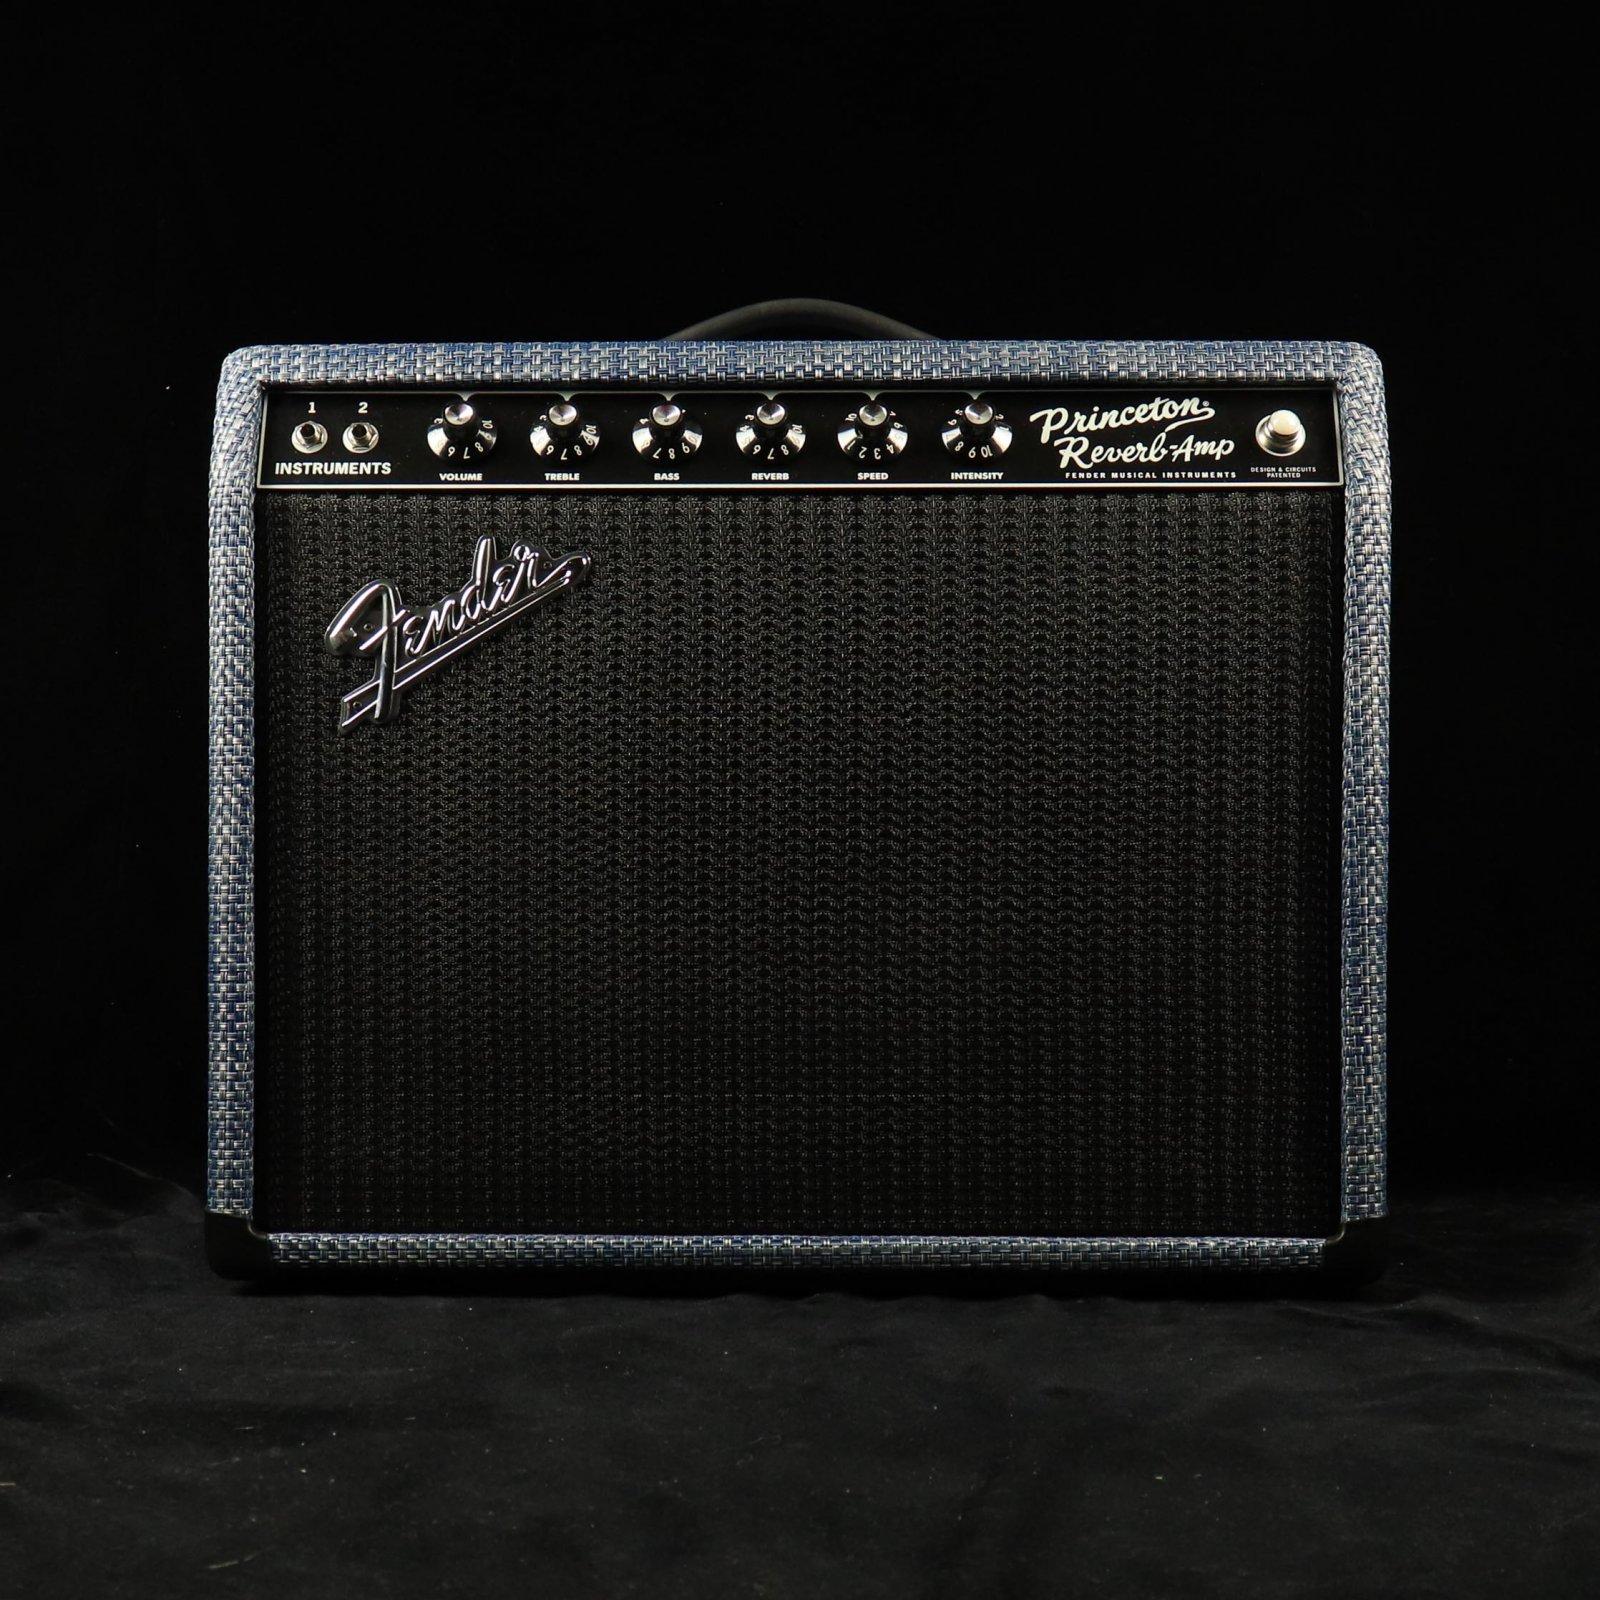 Fender Limited Edition Fender 65' Princeton - Chilewich Denim